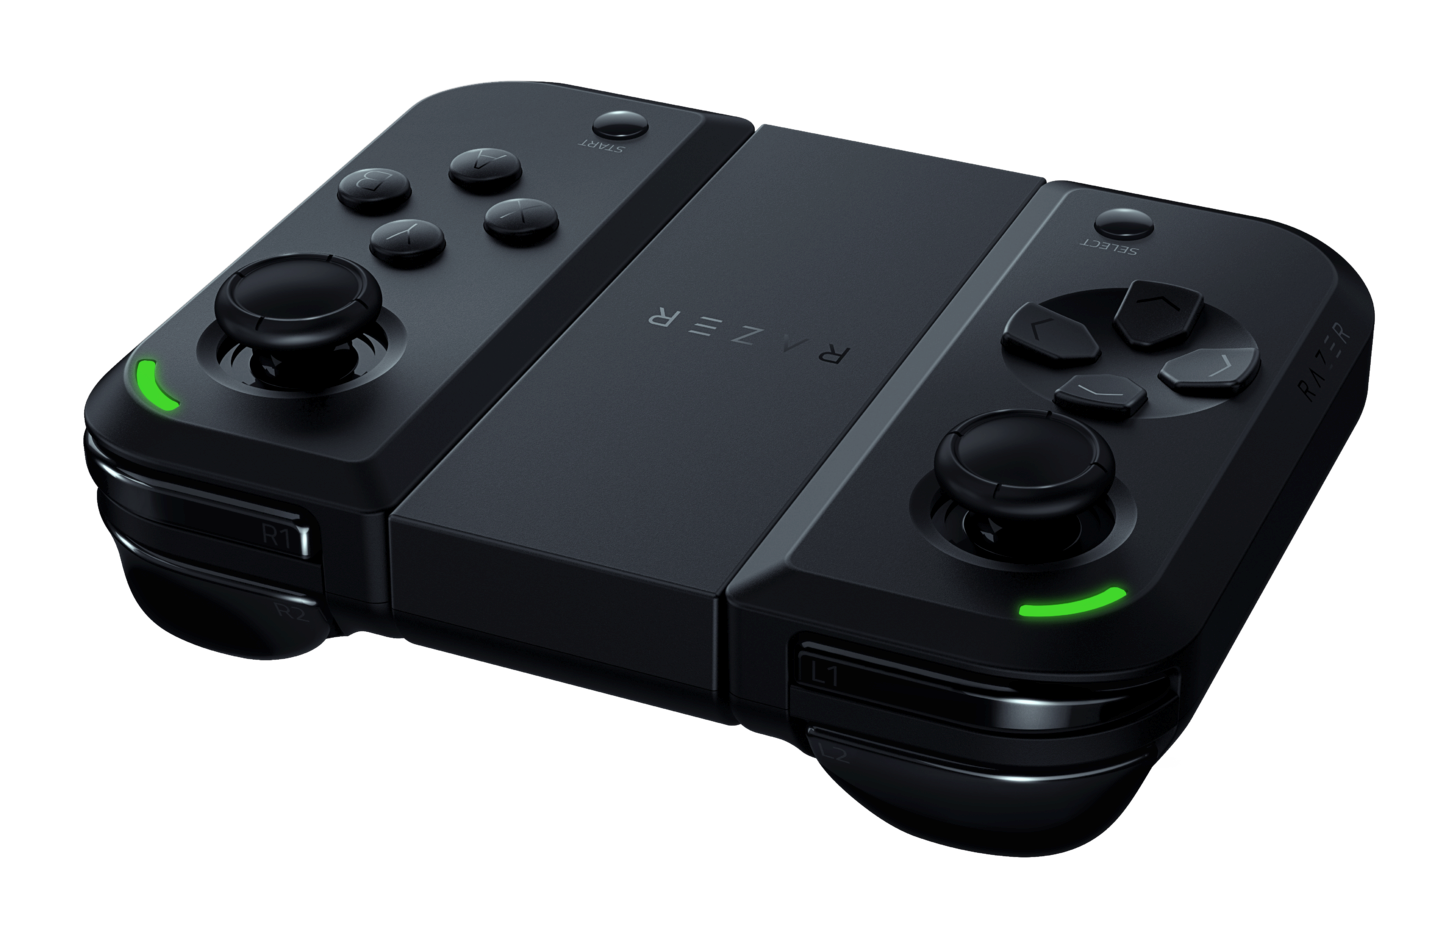 Razer、スマホゲームと相性抜群なワイヤレスデバイス2製品を国内発売!Android用デュアルサイ... 画像